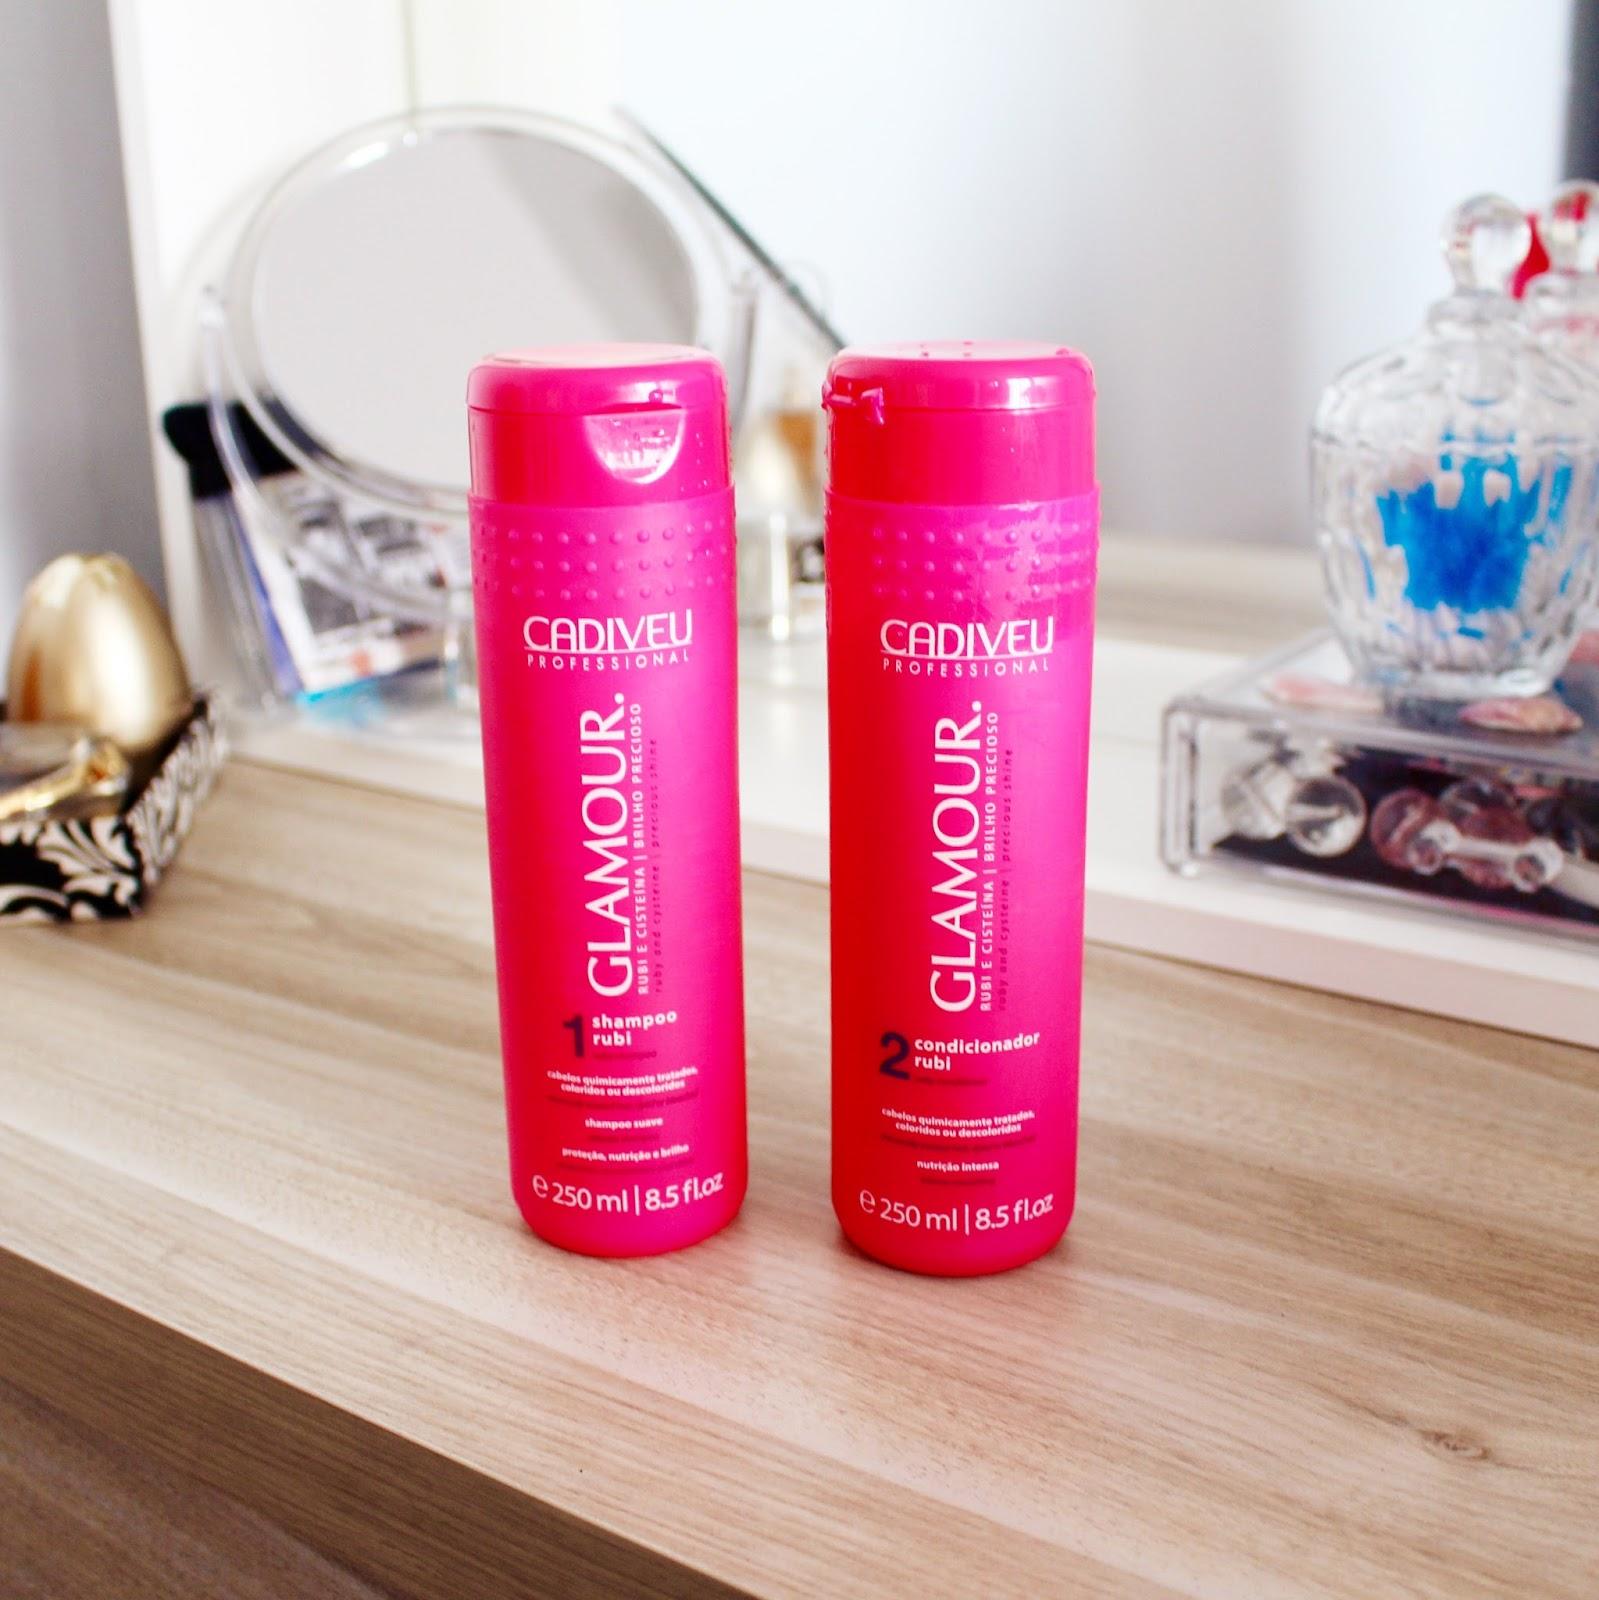 shampoo e condicionador da Cadiveu